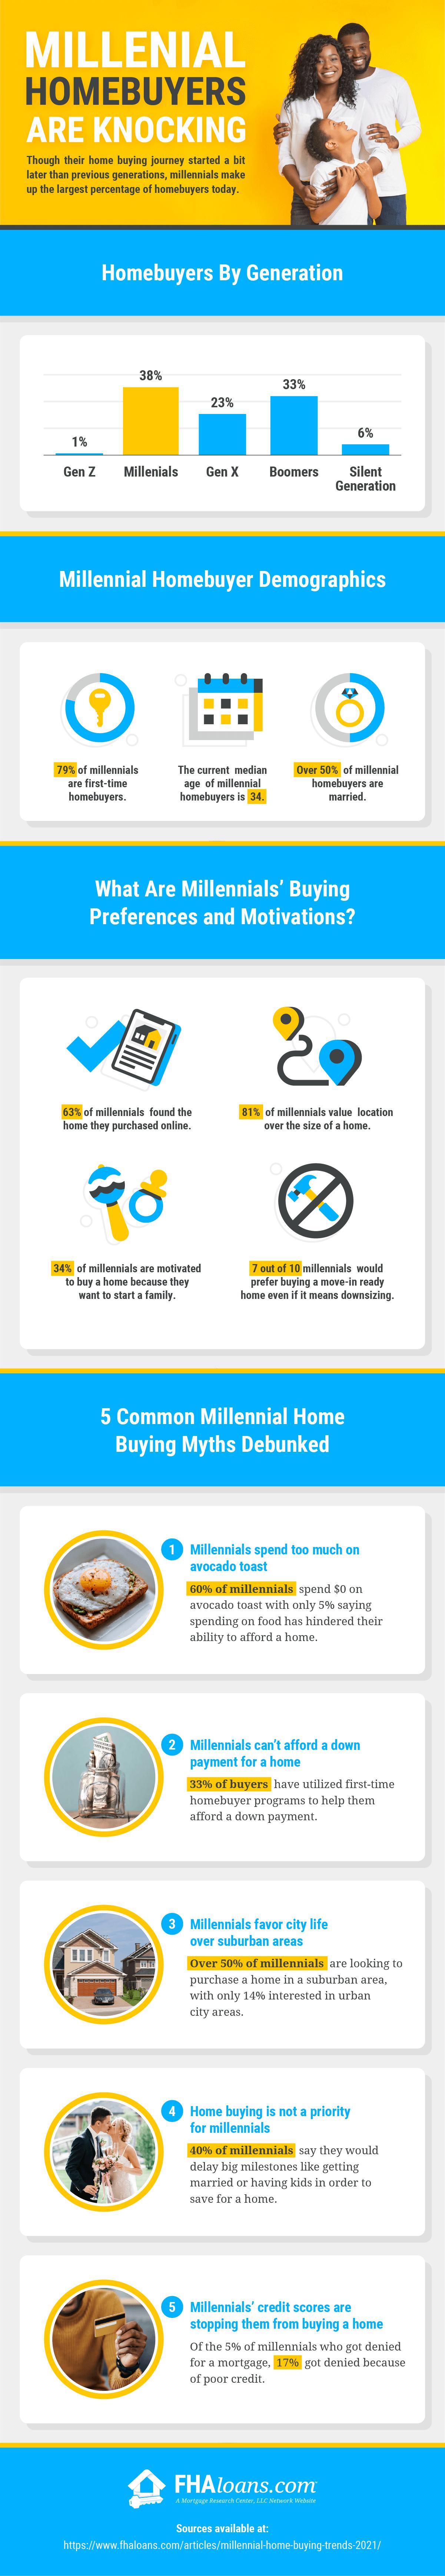 millennial homebuyers infographic